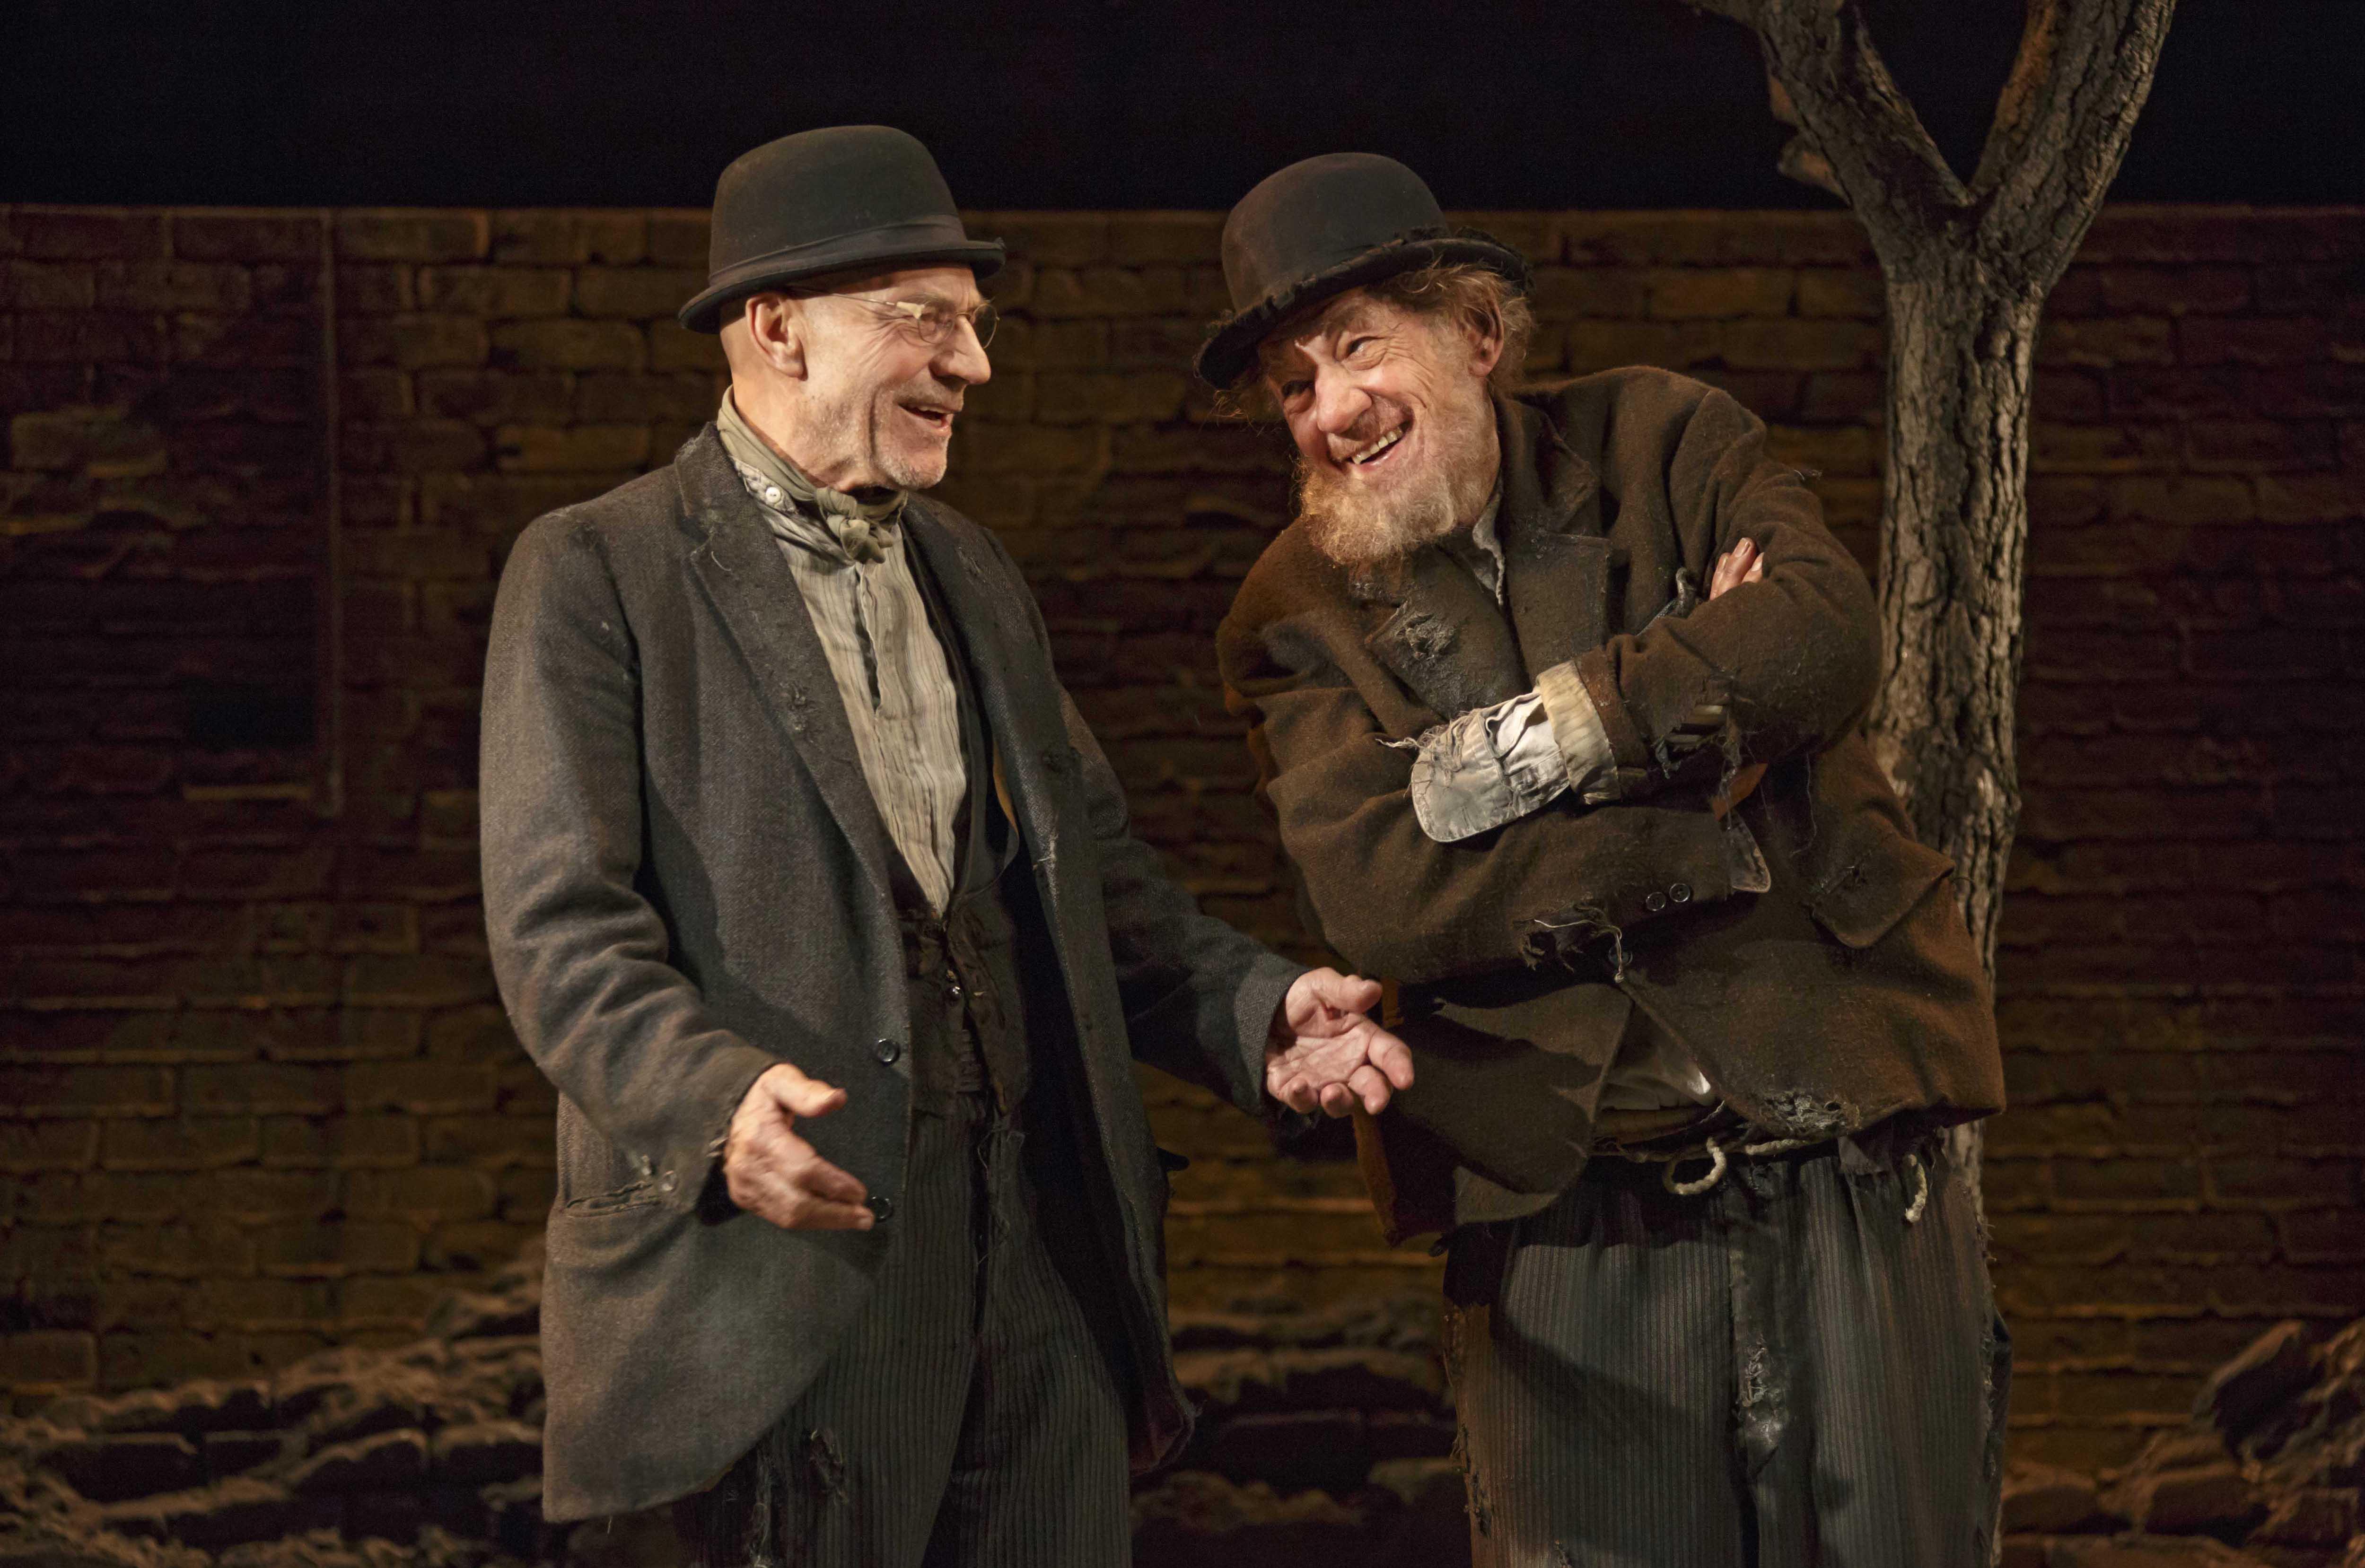 Patrick Stewart, left, and Ian McKellen star in Samuel Beckett's play Waiting for Godot.